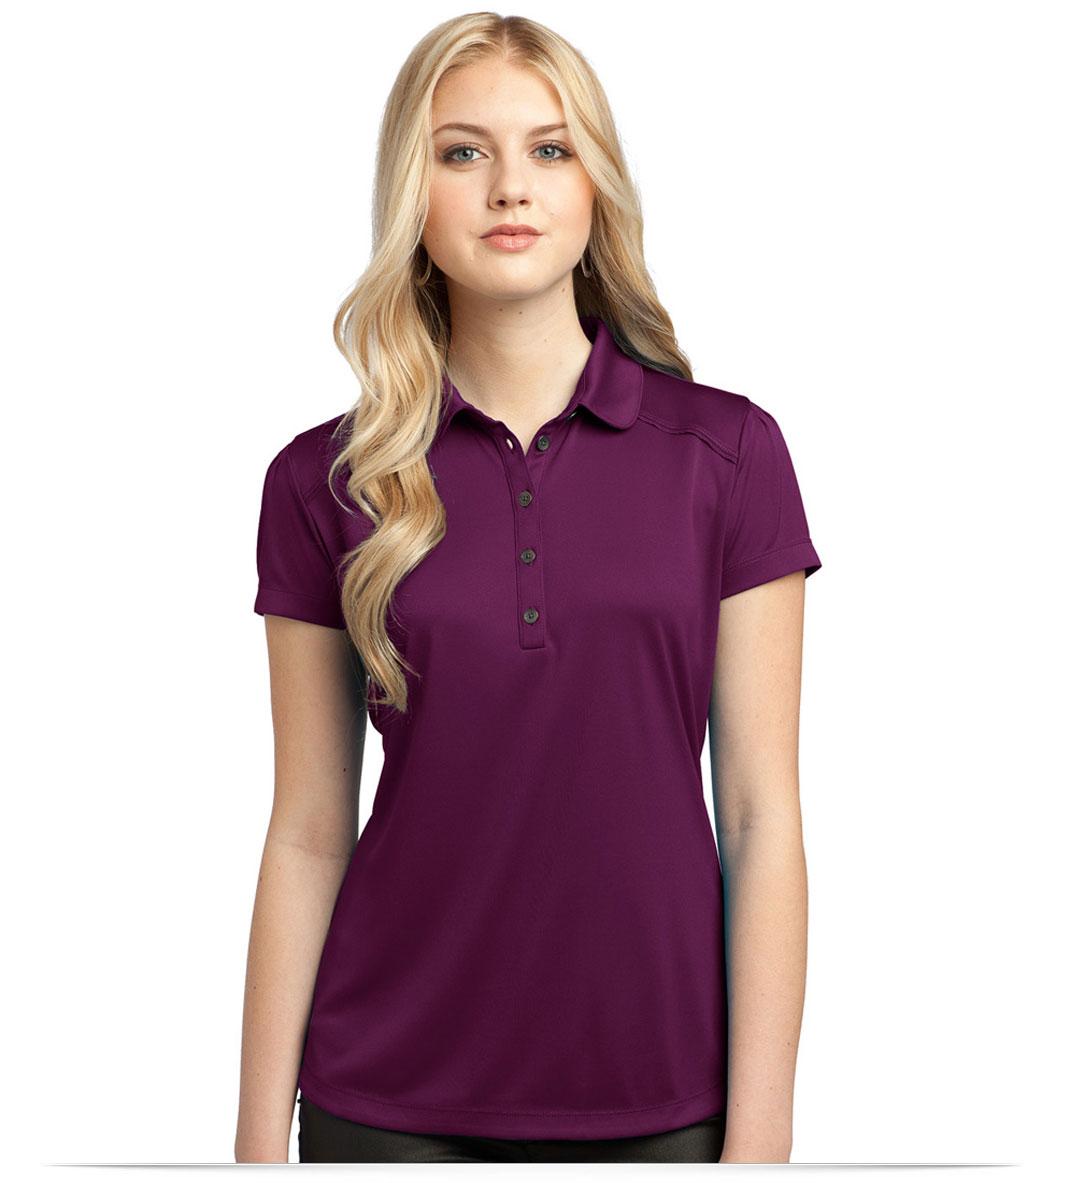 Personalized Logo Ogio Vamp Ladies Golf Shirt